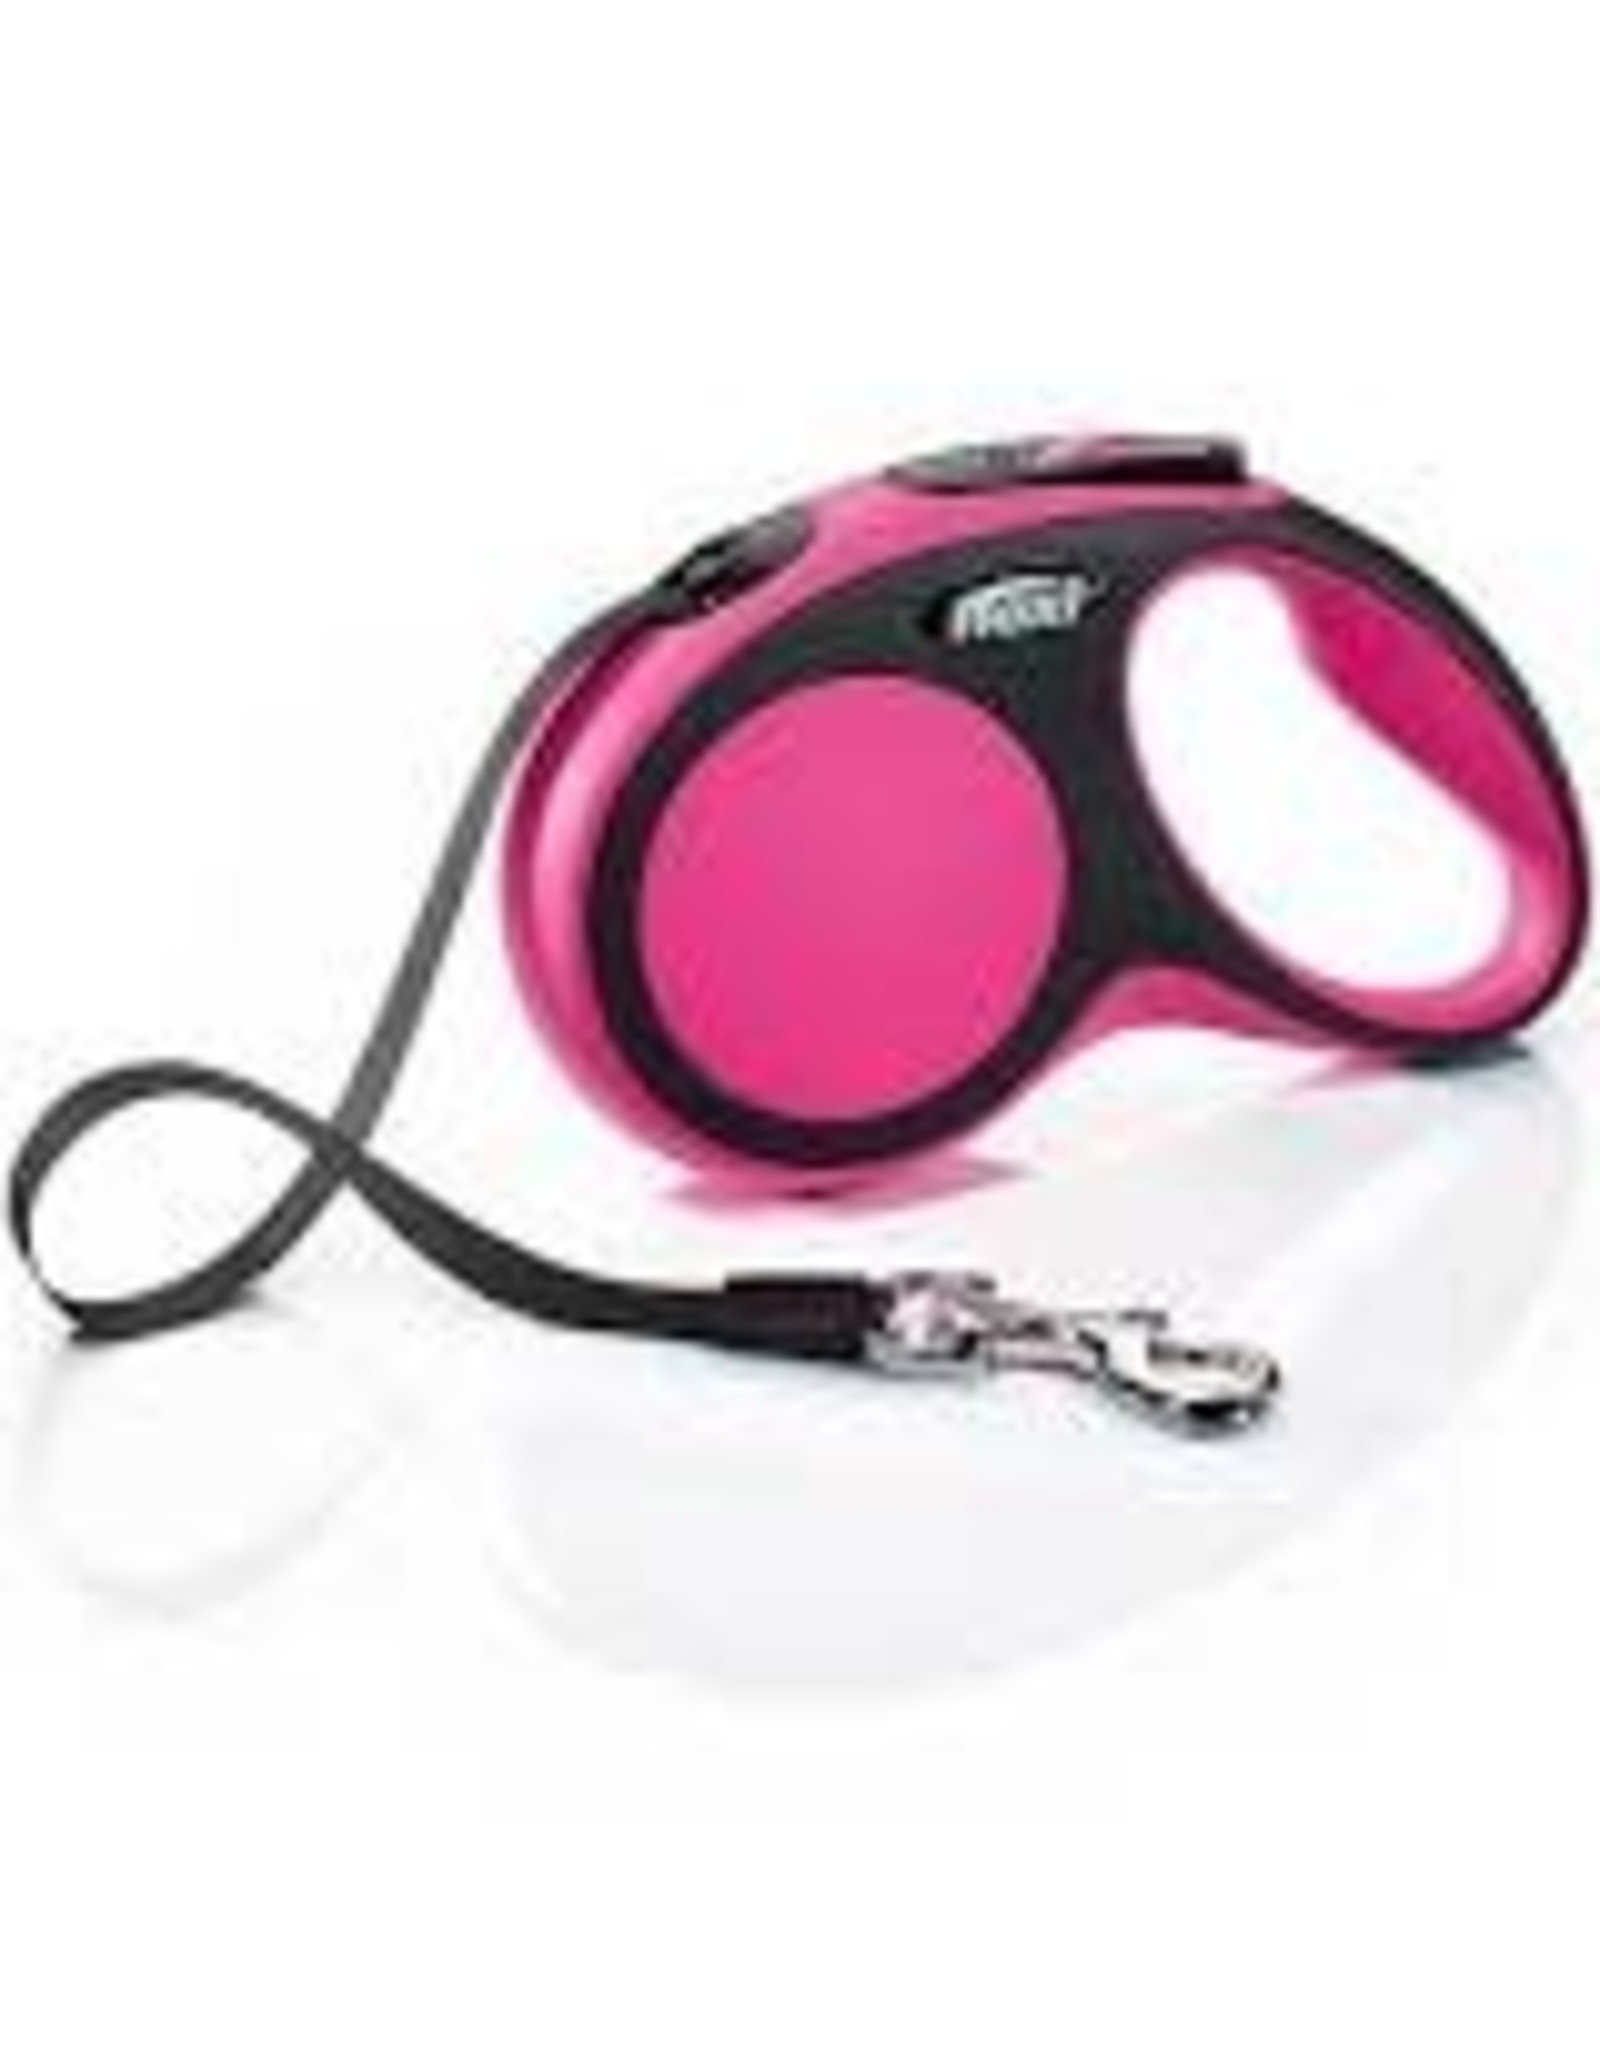 Flexi Flexi - Comfort Tape Pink